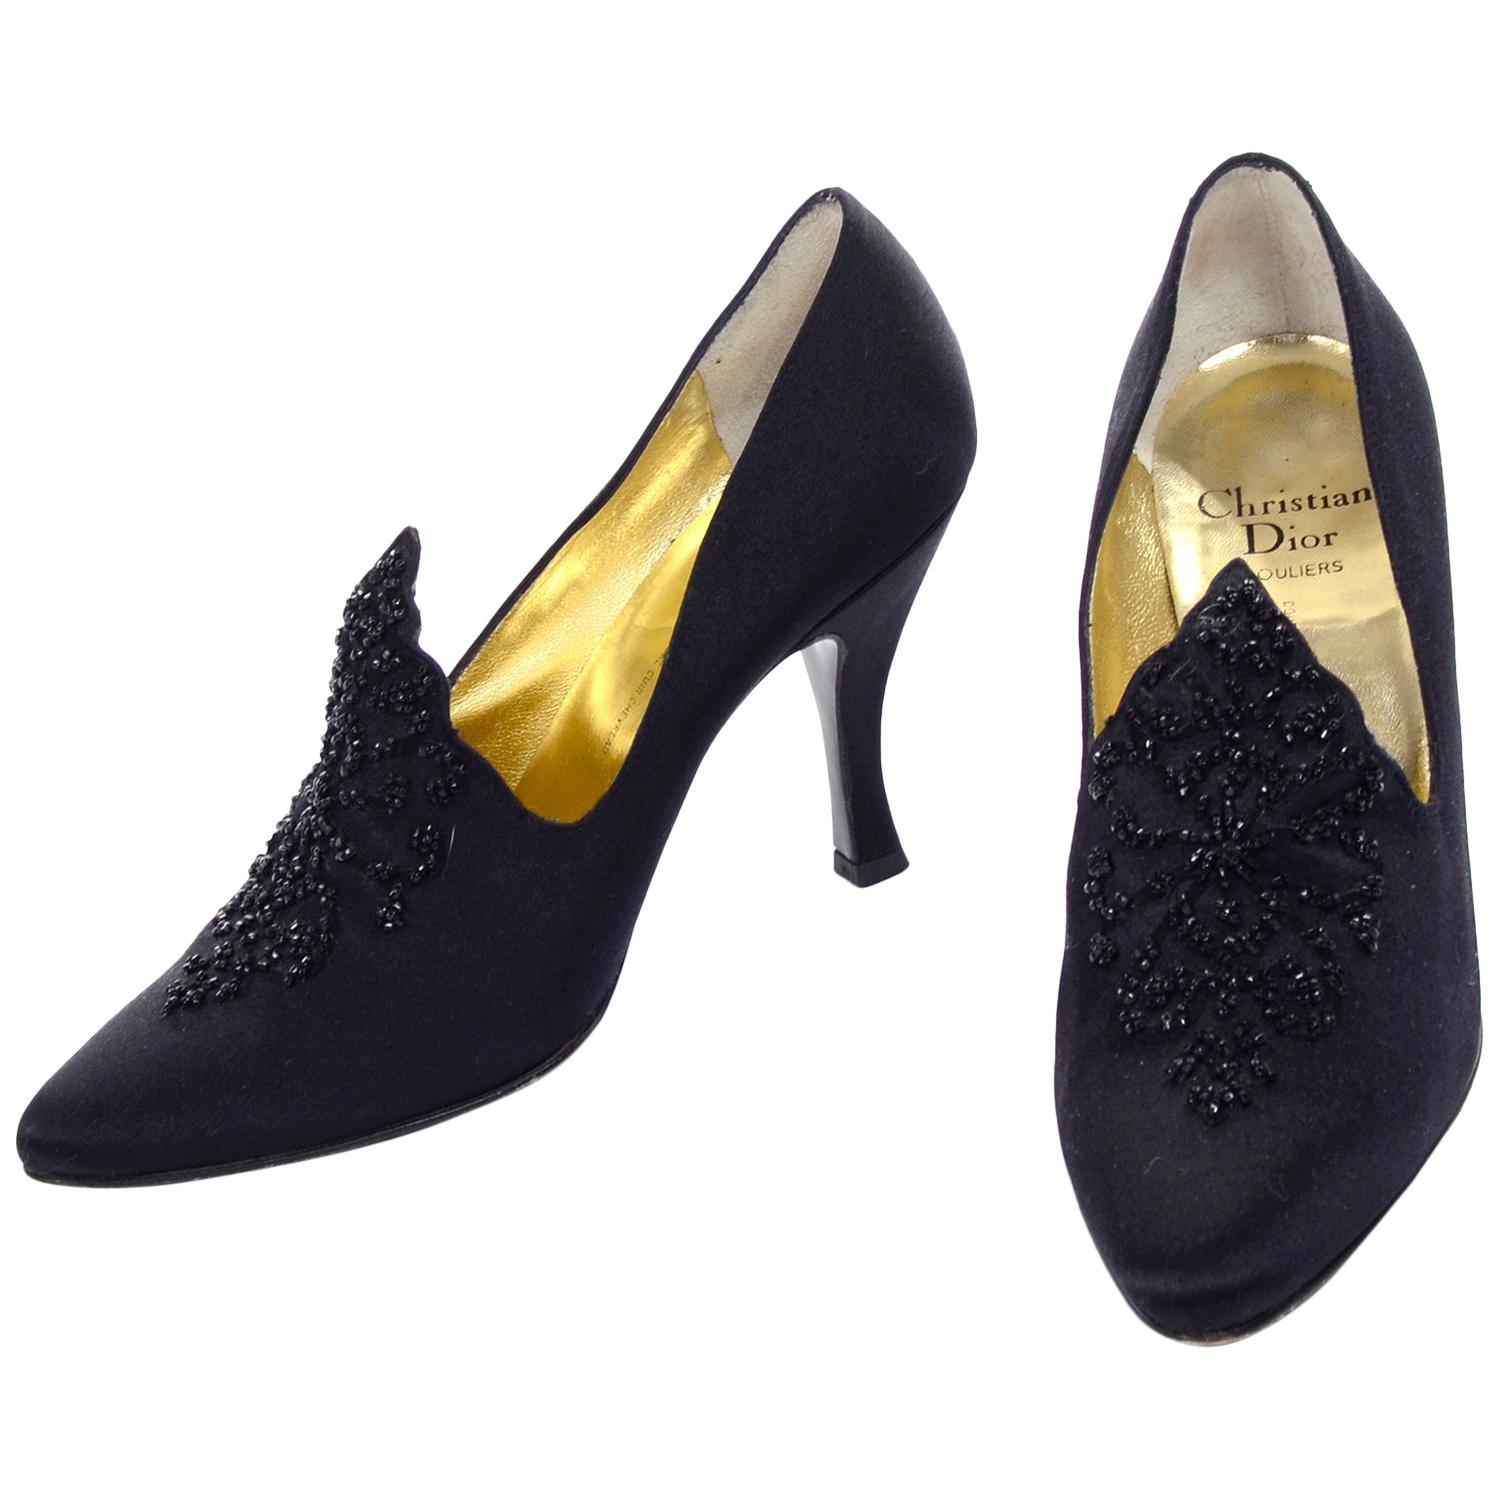 Christian Dior Souliers Vintage Black Satin Beaded Shoes Size 8 W/ Bag & Box